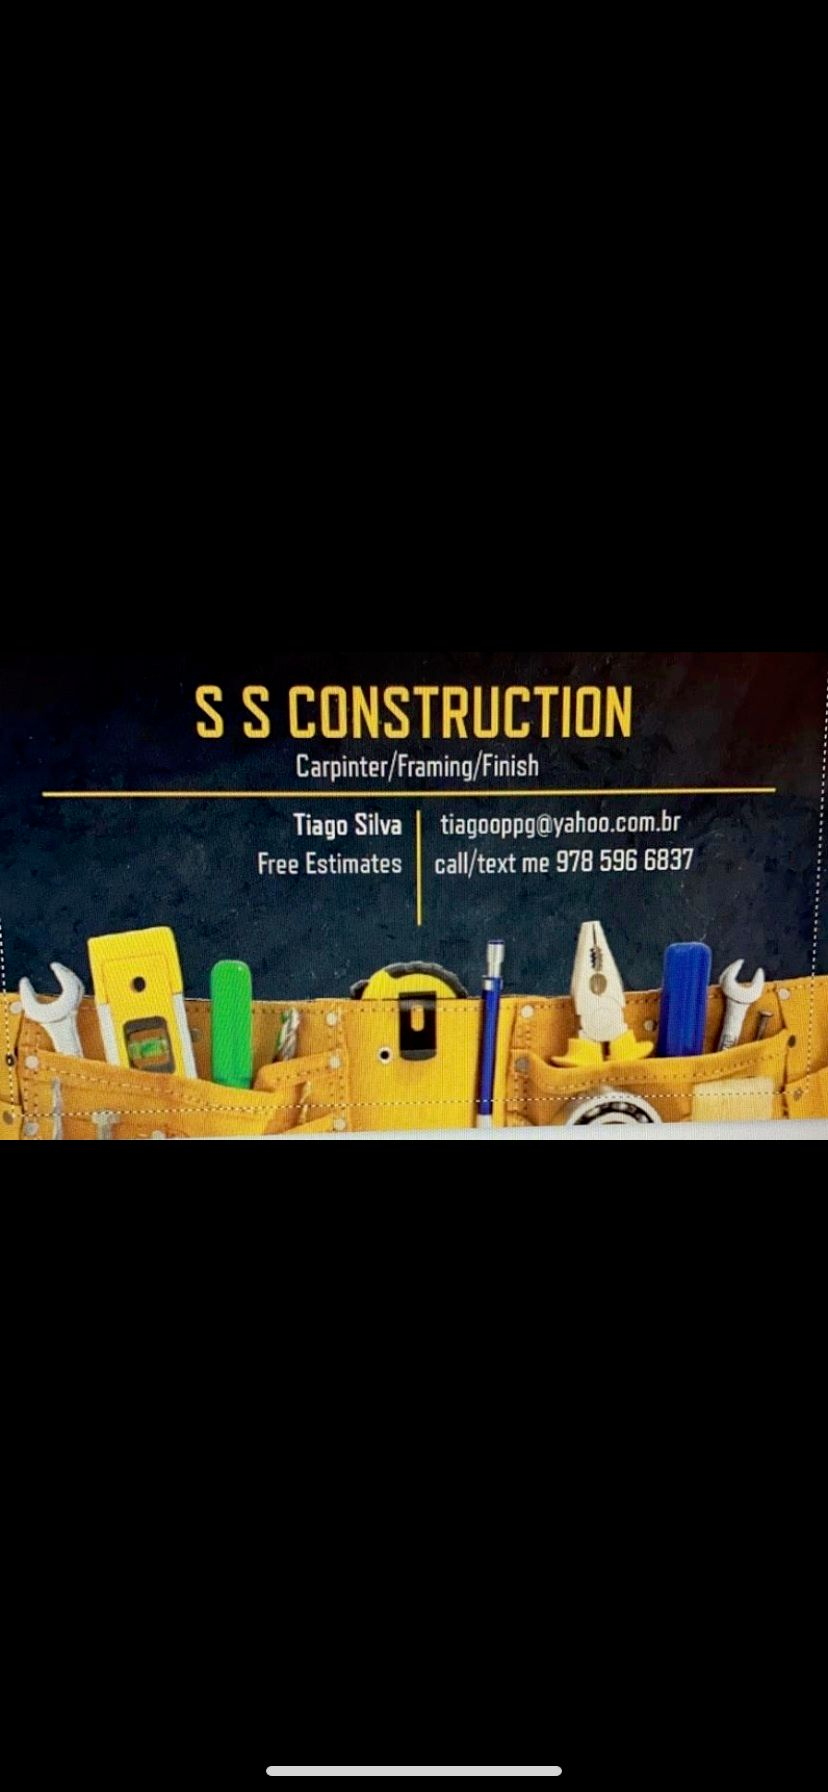 S.S. CONSTRUCTION